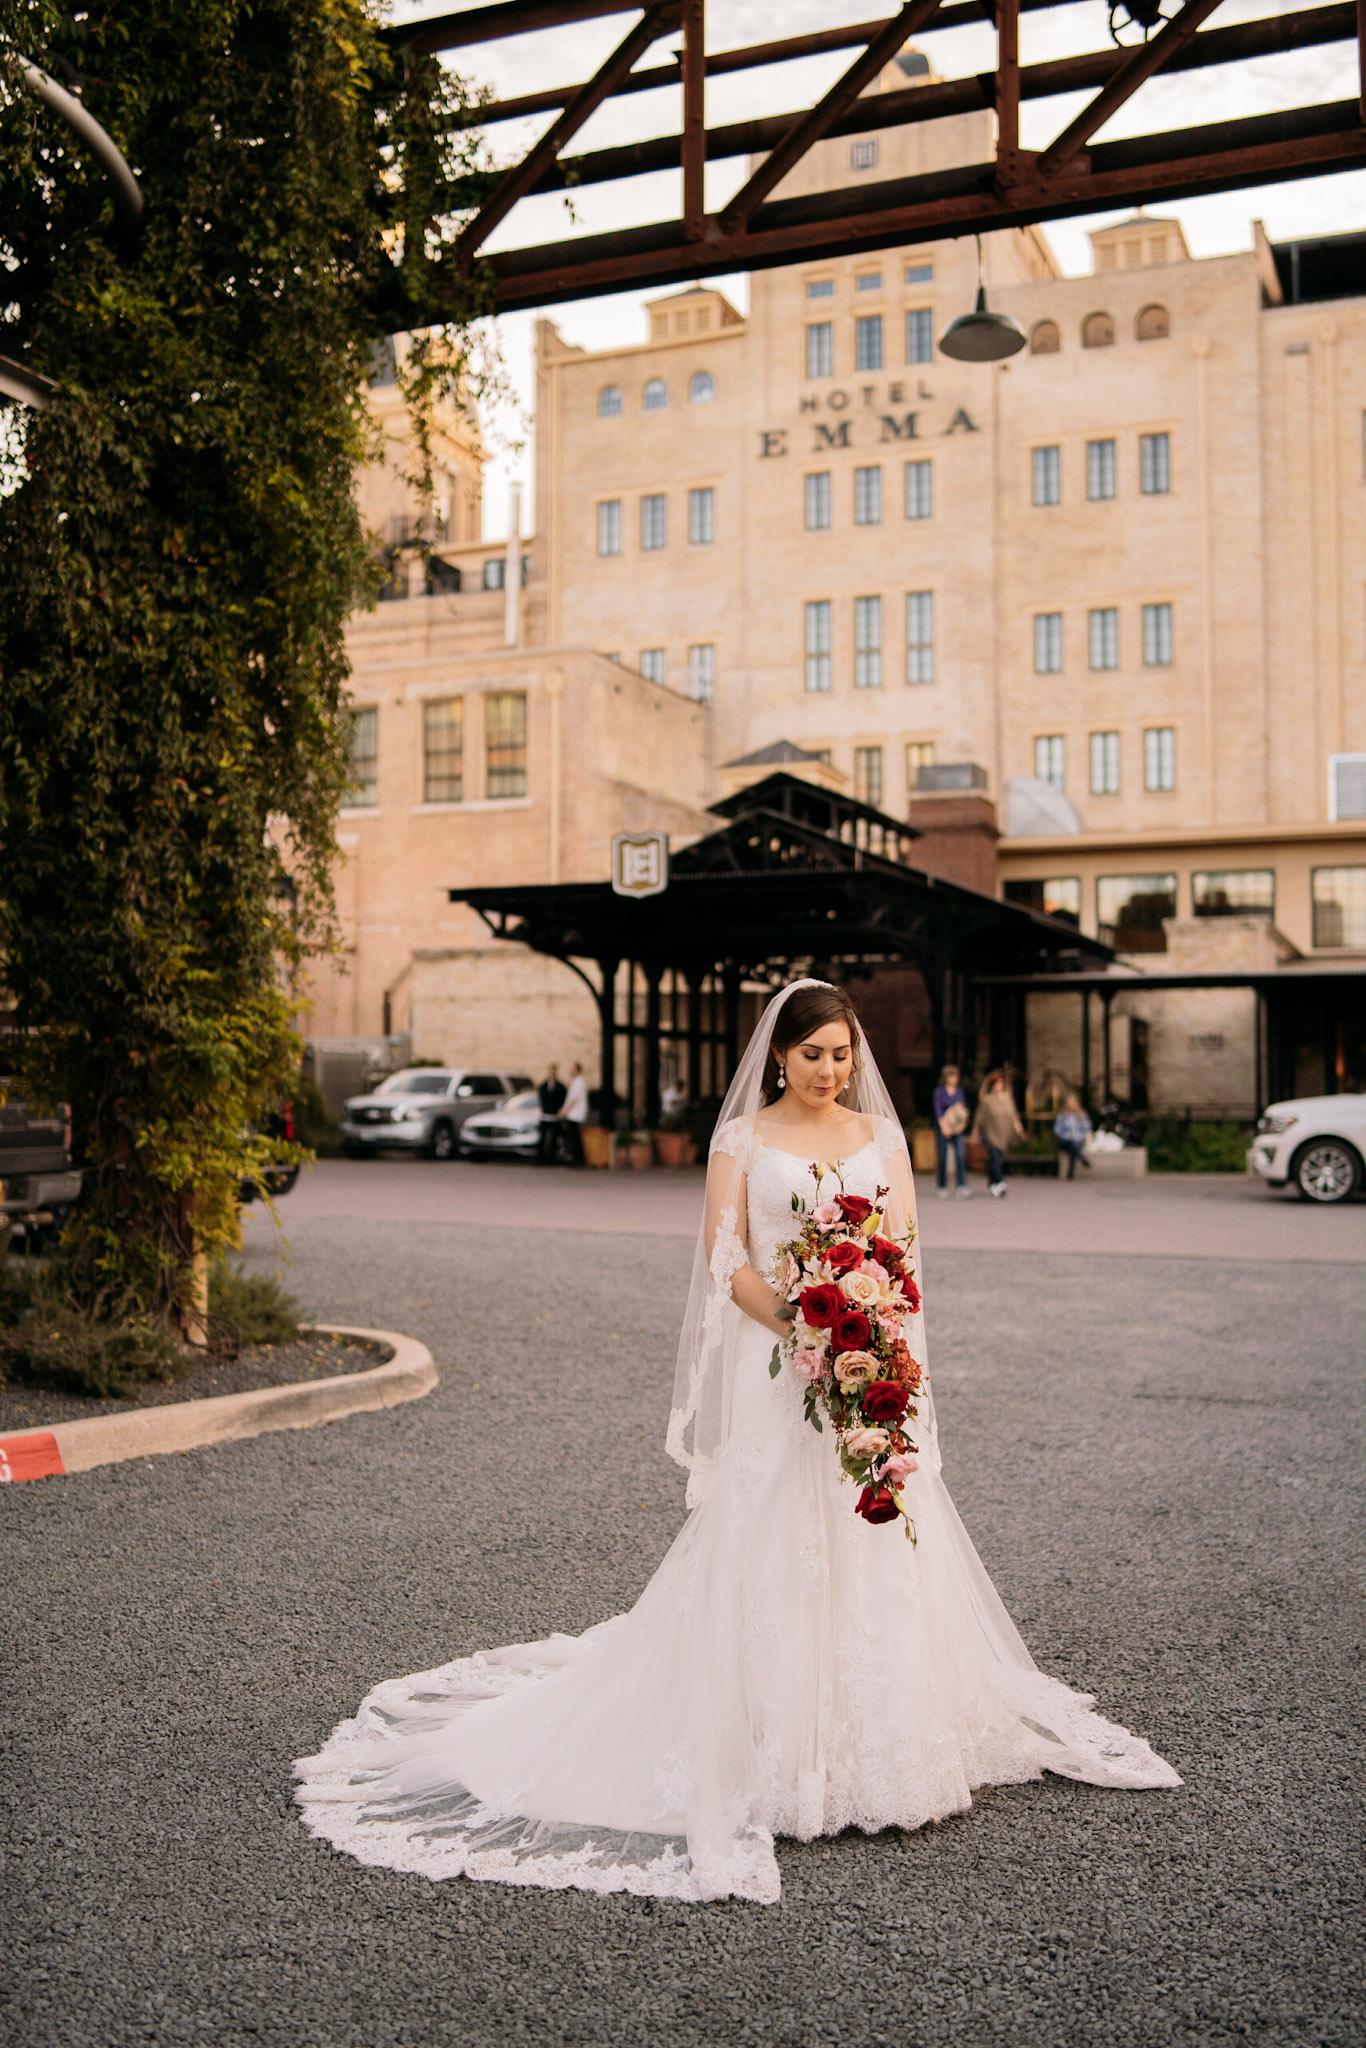 20181124-Brooke-TreyGarcia-Wedding-AdrianGarcia-FOMASCine_BR35721.jpg